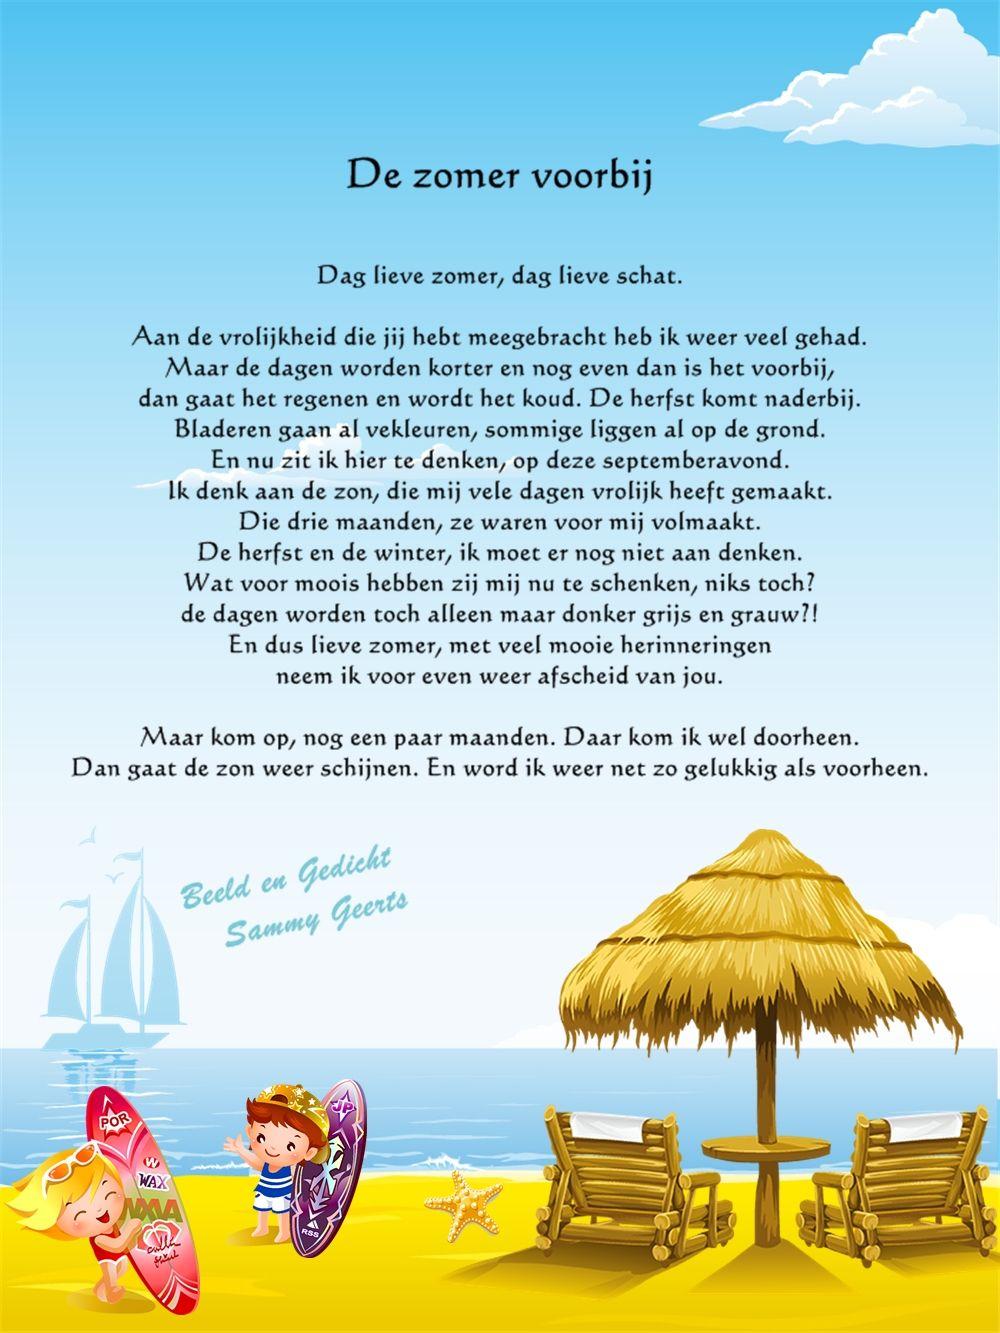 Citaten Zomer Realty : Dag lieve zomer schat spreuken gedichten